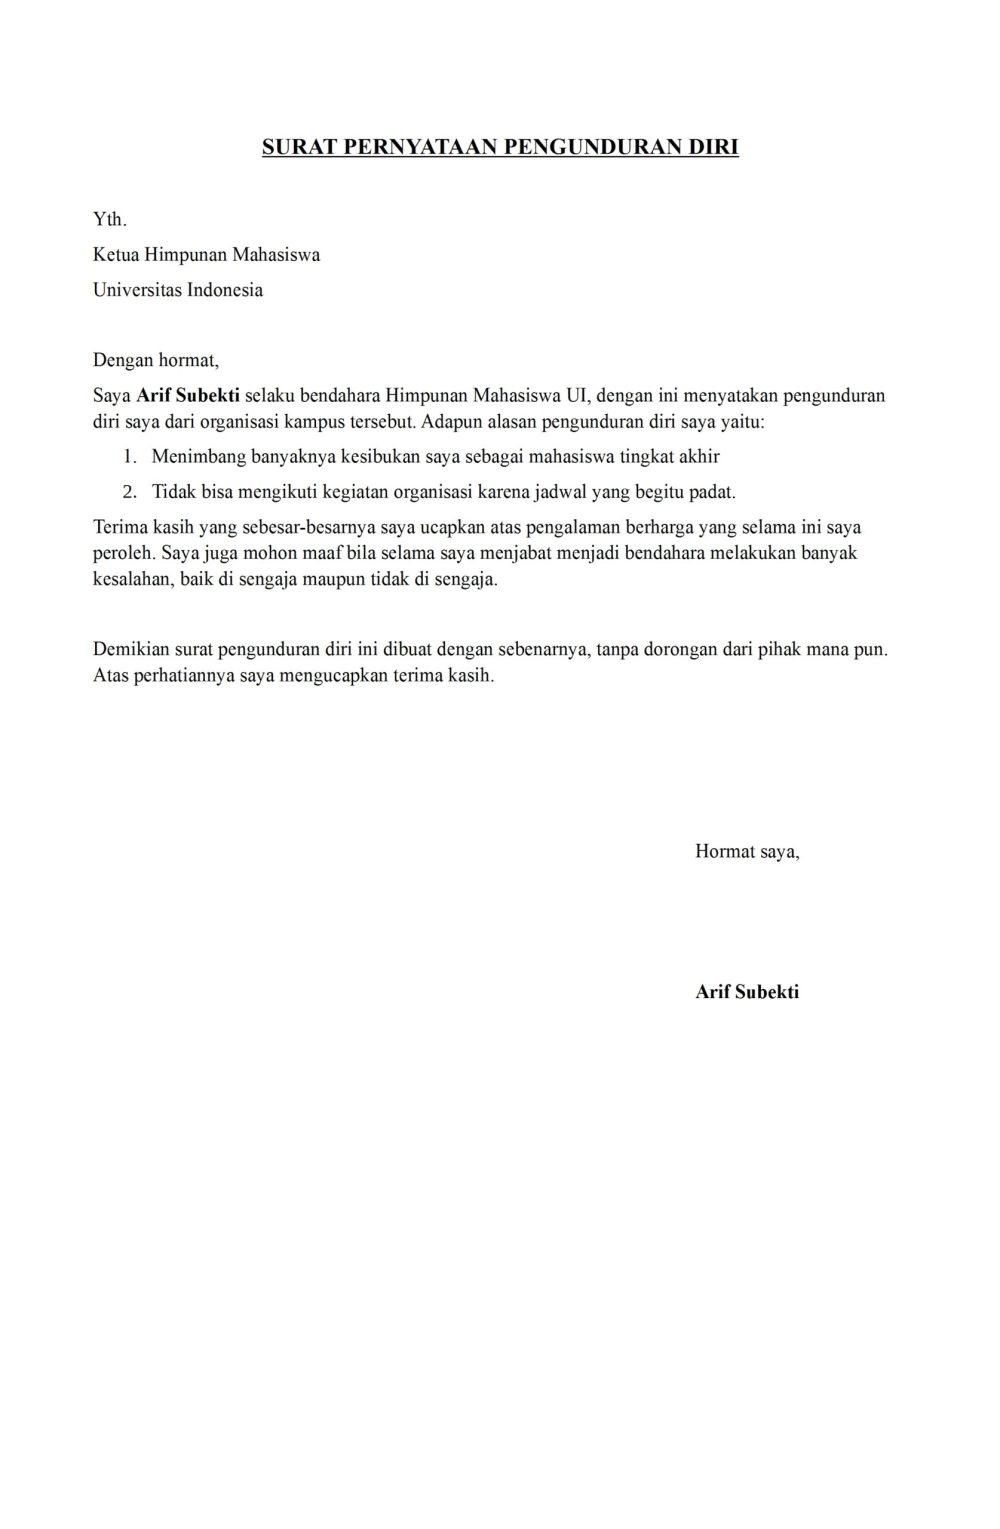 16 Contoh Surat Pengunduran Diri dari Organisasi Lengkap ...